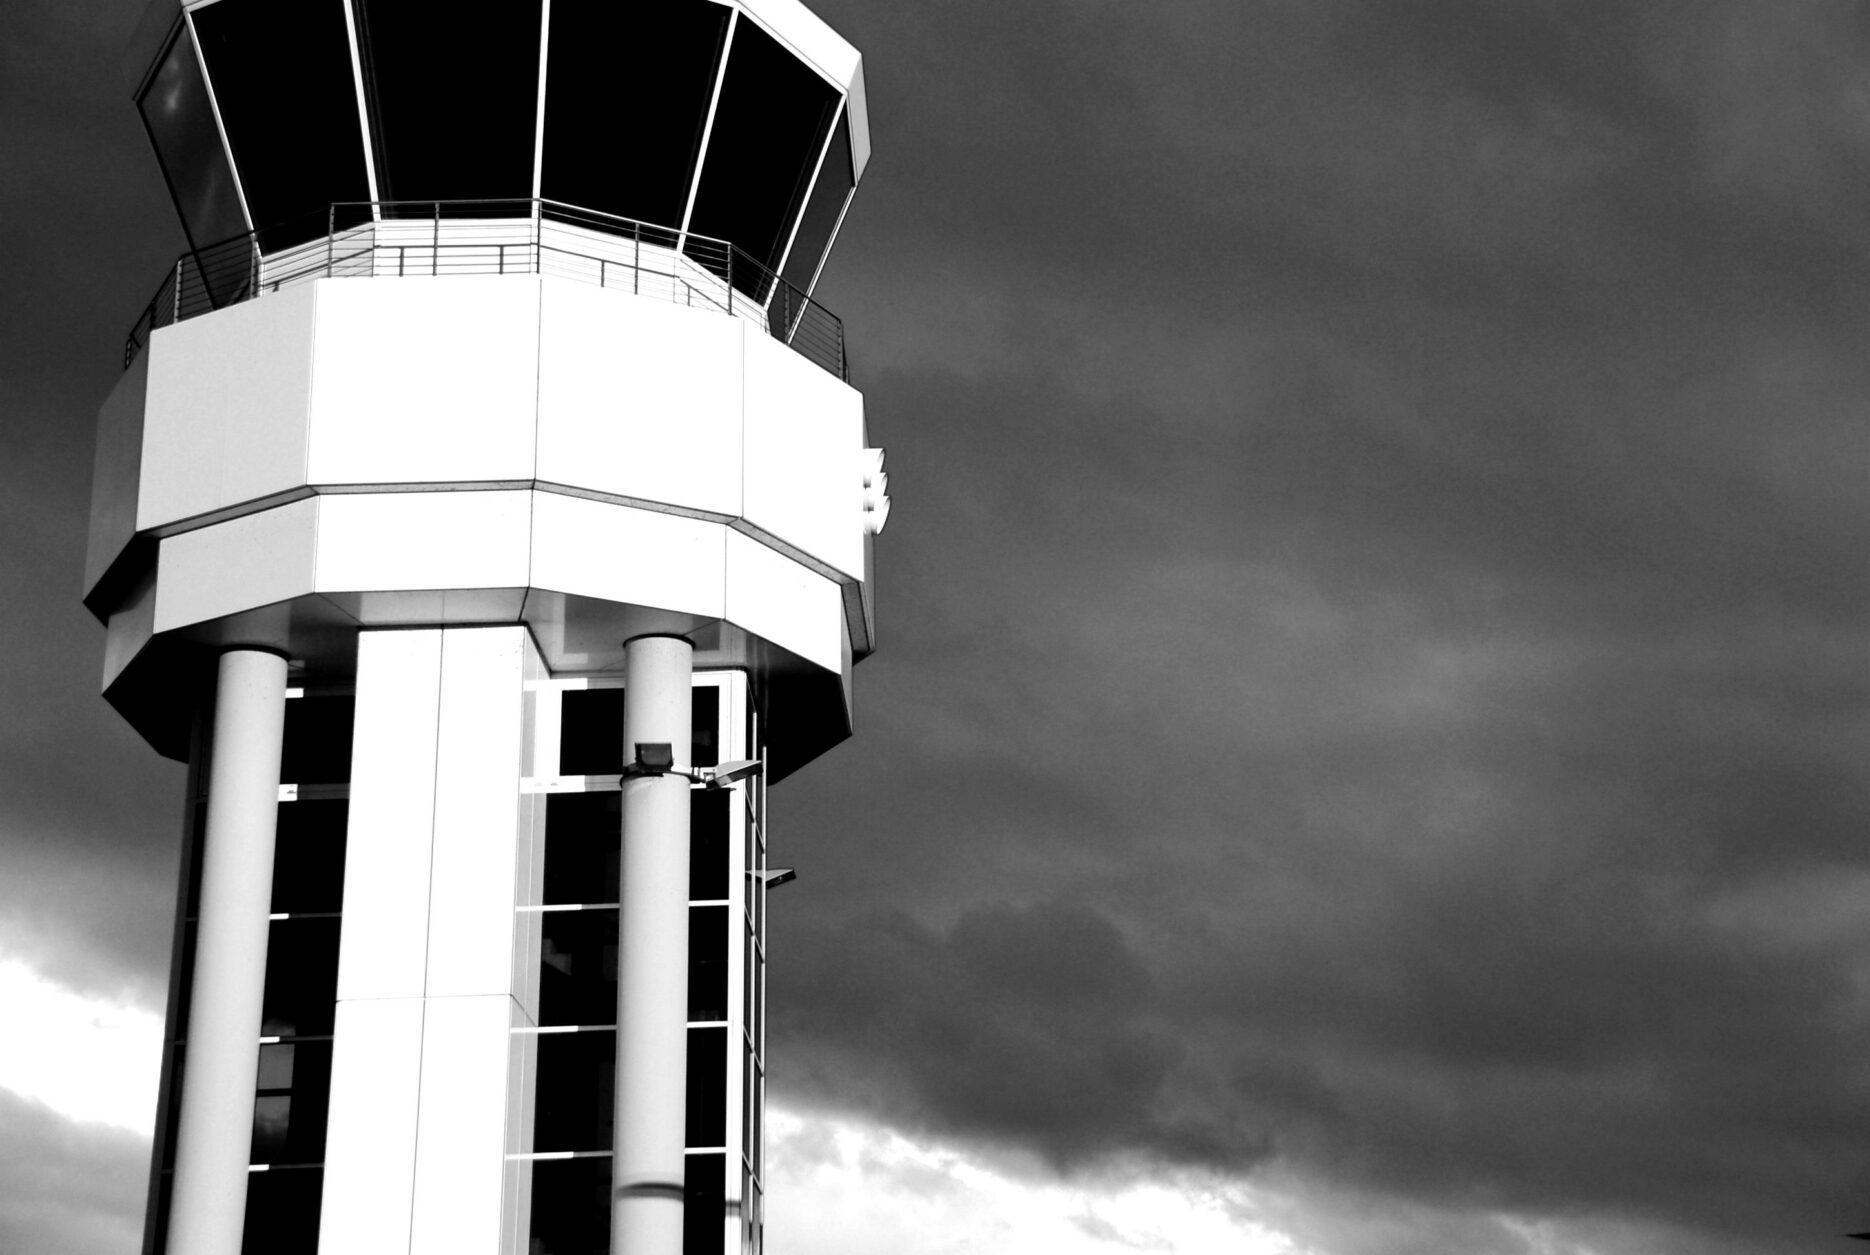 Flughafen Bern BRN Tower